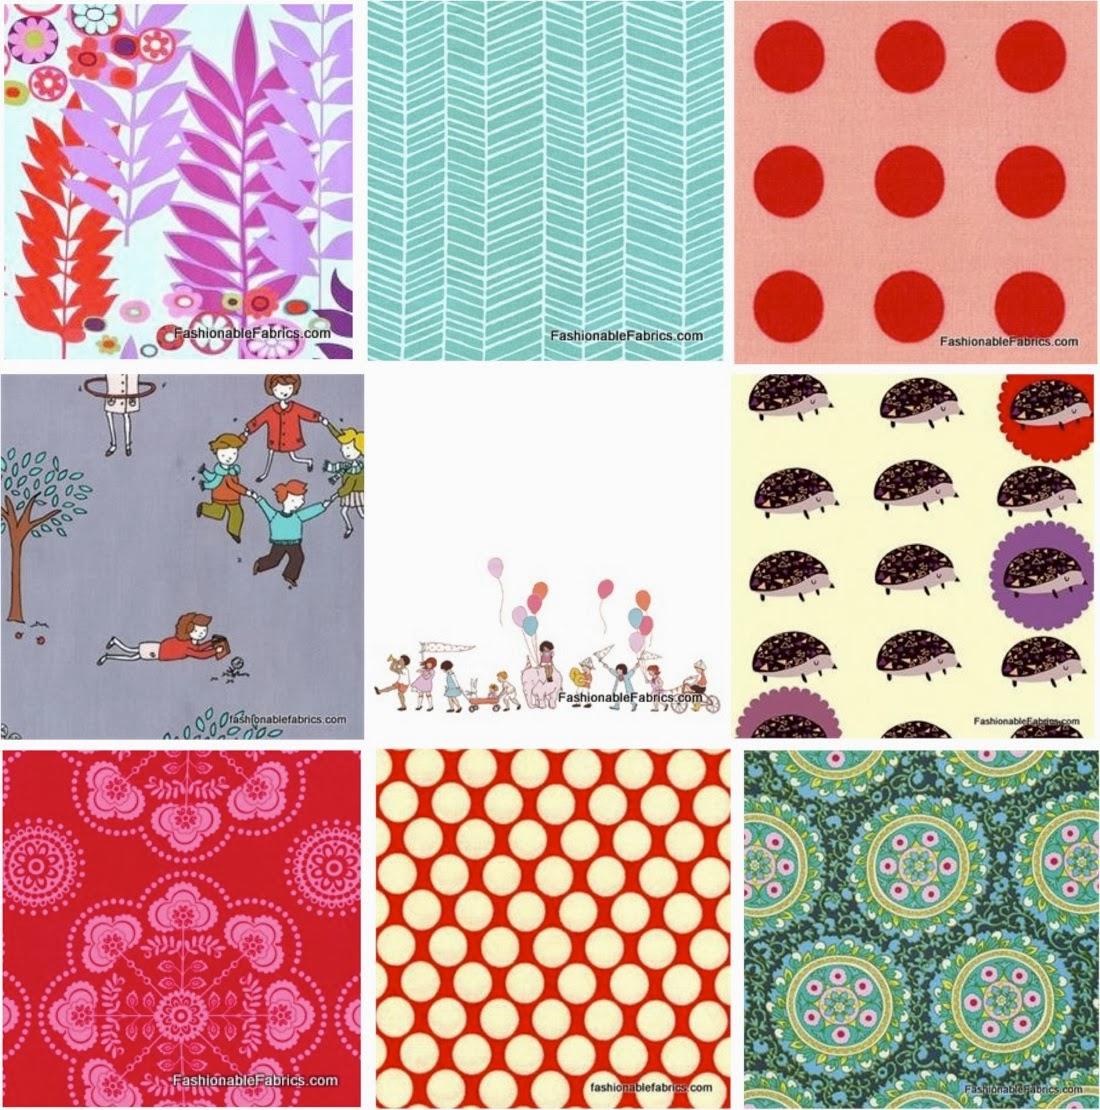 Givethanksaway 100 Of Fashionable Fabrics Closed